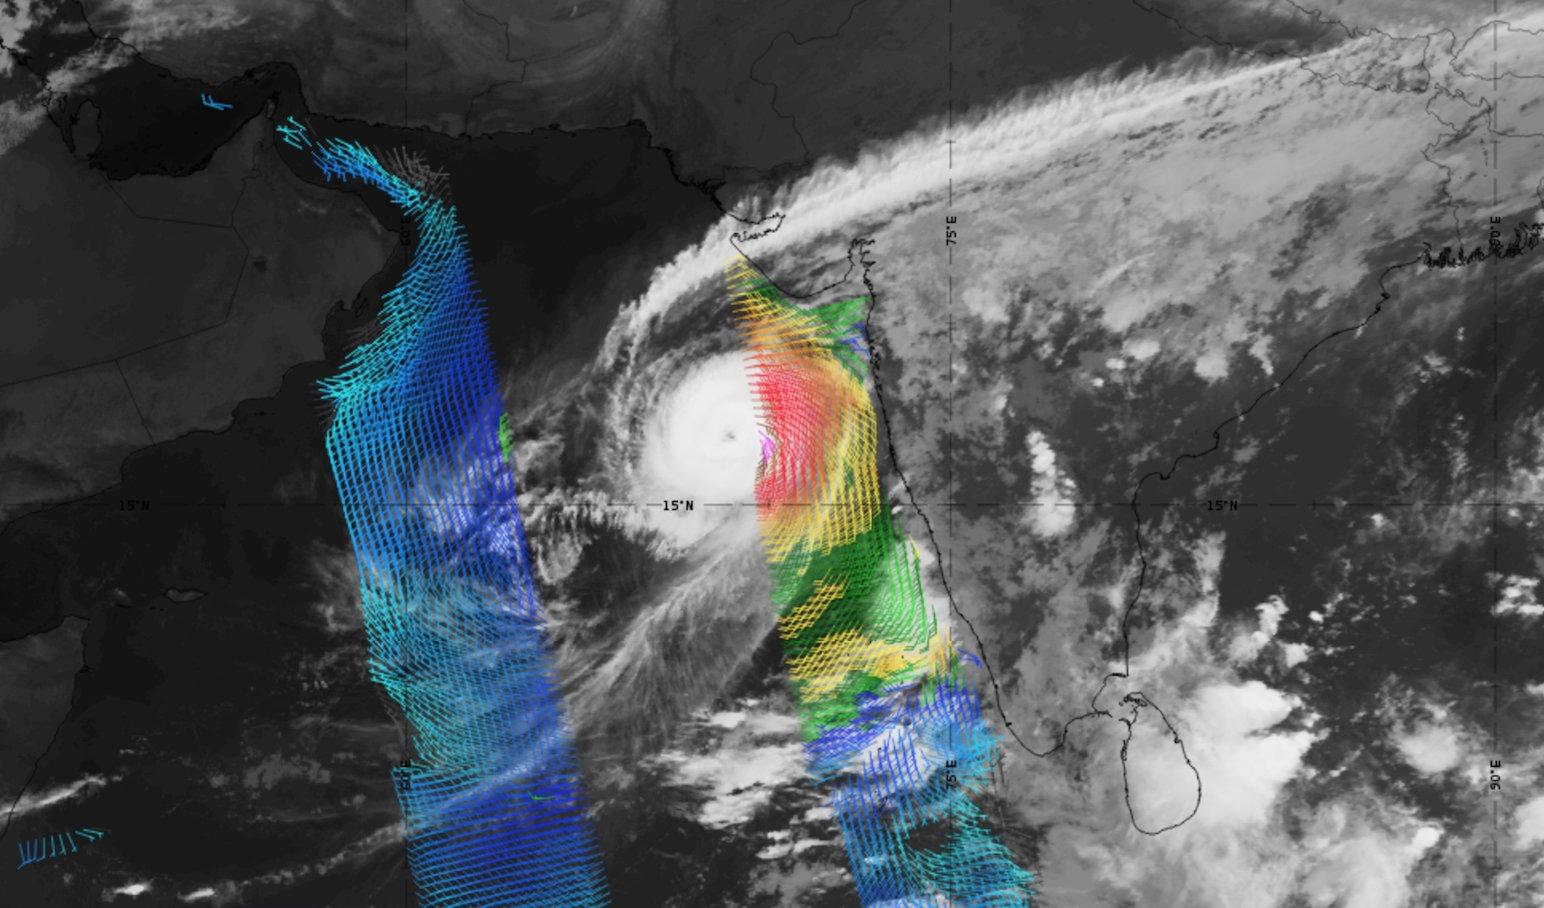 Meteosat-8 IR10.8 with Metop-A ASCAT winds overlaid, 27 Oct 18:00 UTC